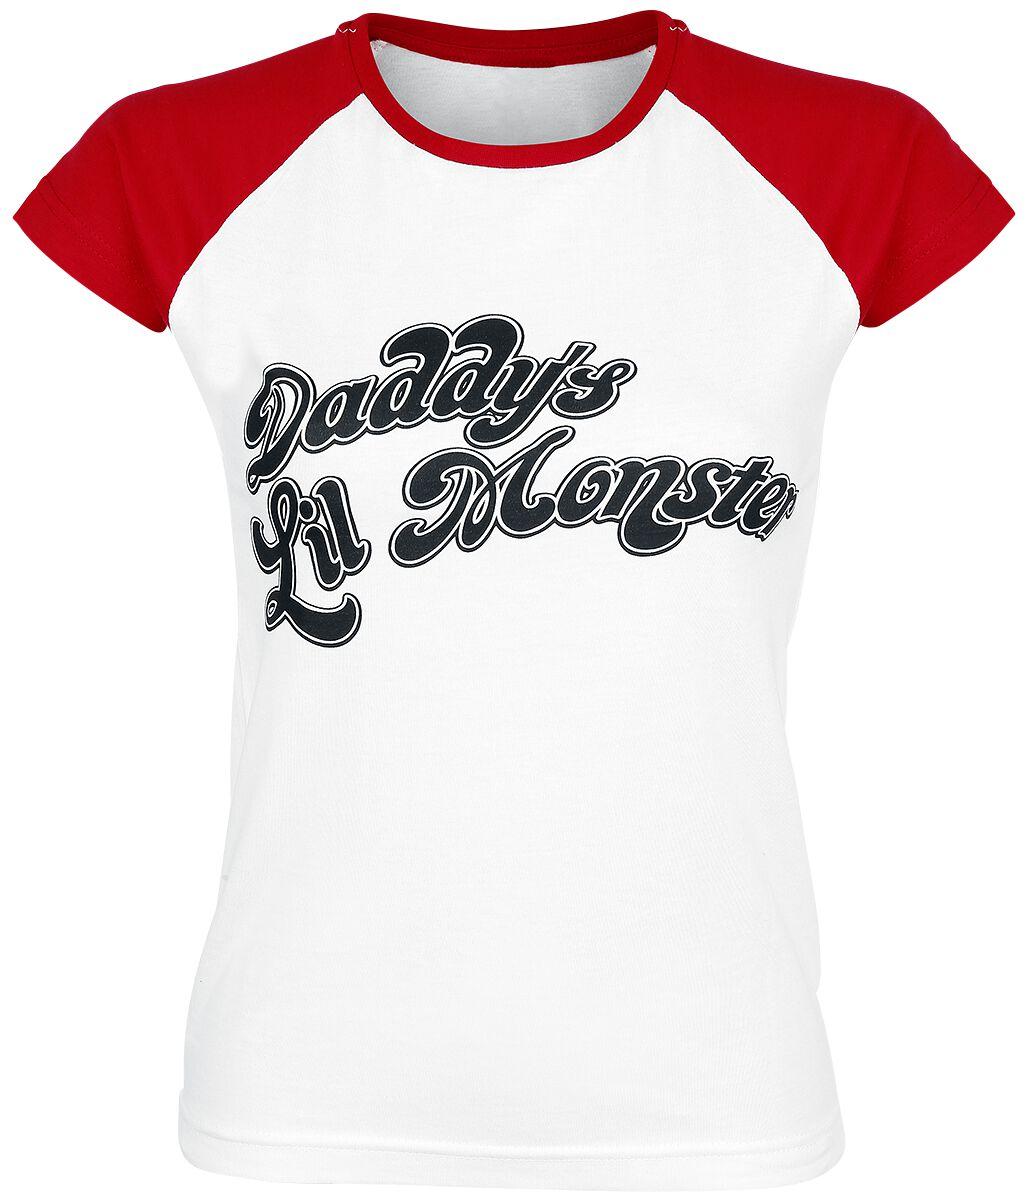 Merch dla Fanów - Koszulki - Koszulka damska Suicide Squad Harley Quinn - Daddy's Little Monster Koszulka damska biały/czerwony - 334609